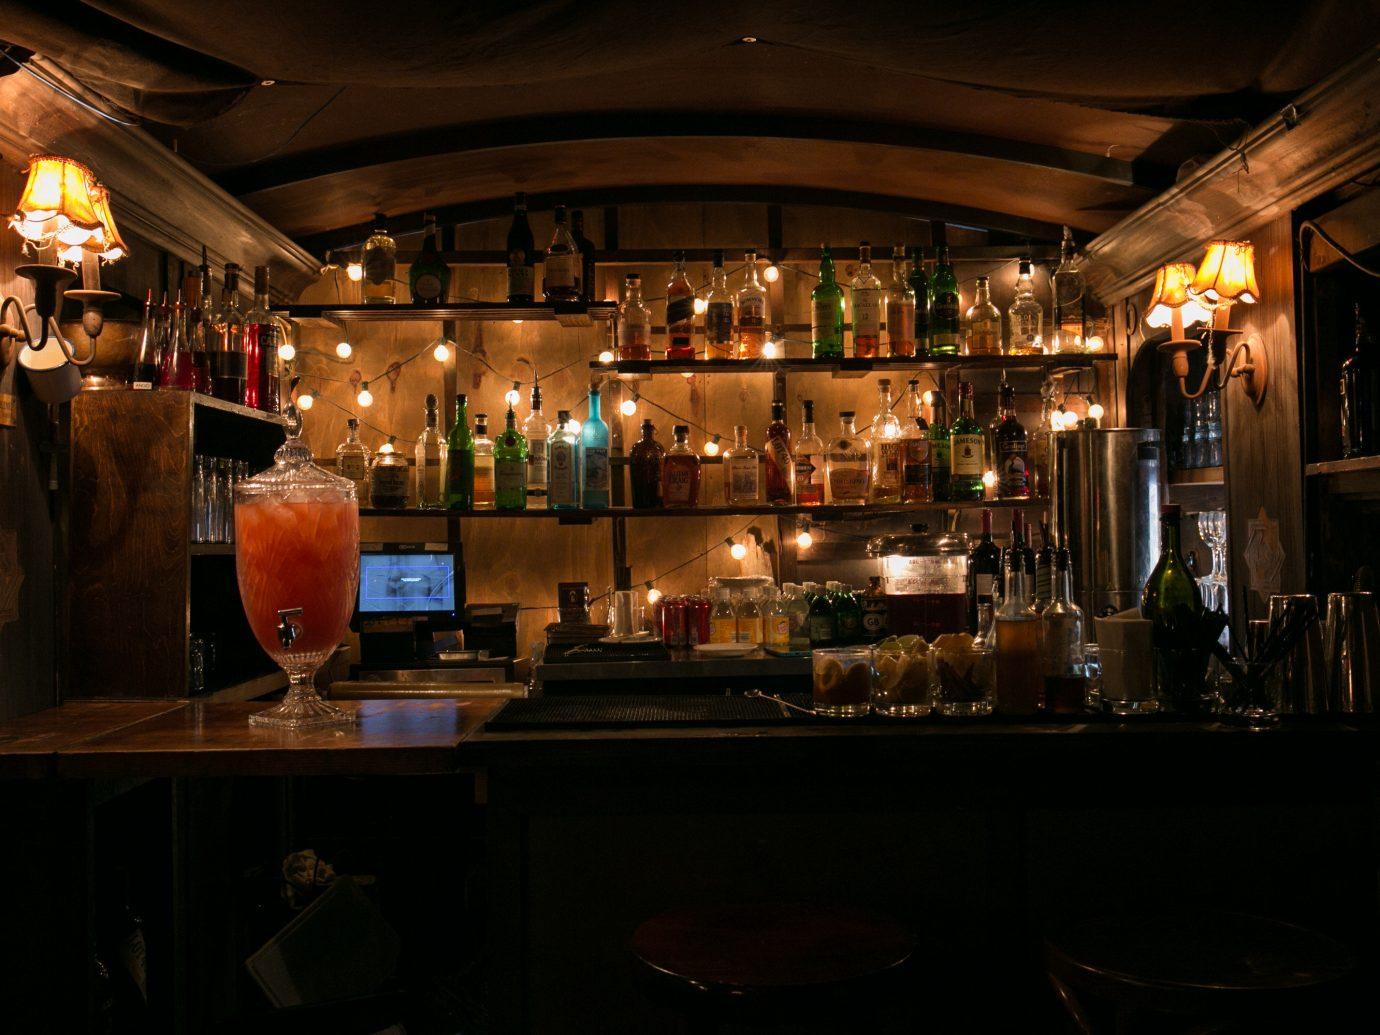 Food + Drink ceiling indoor Bar night restaurant meal several